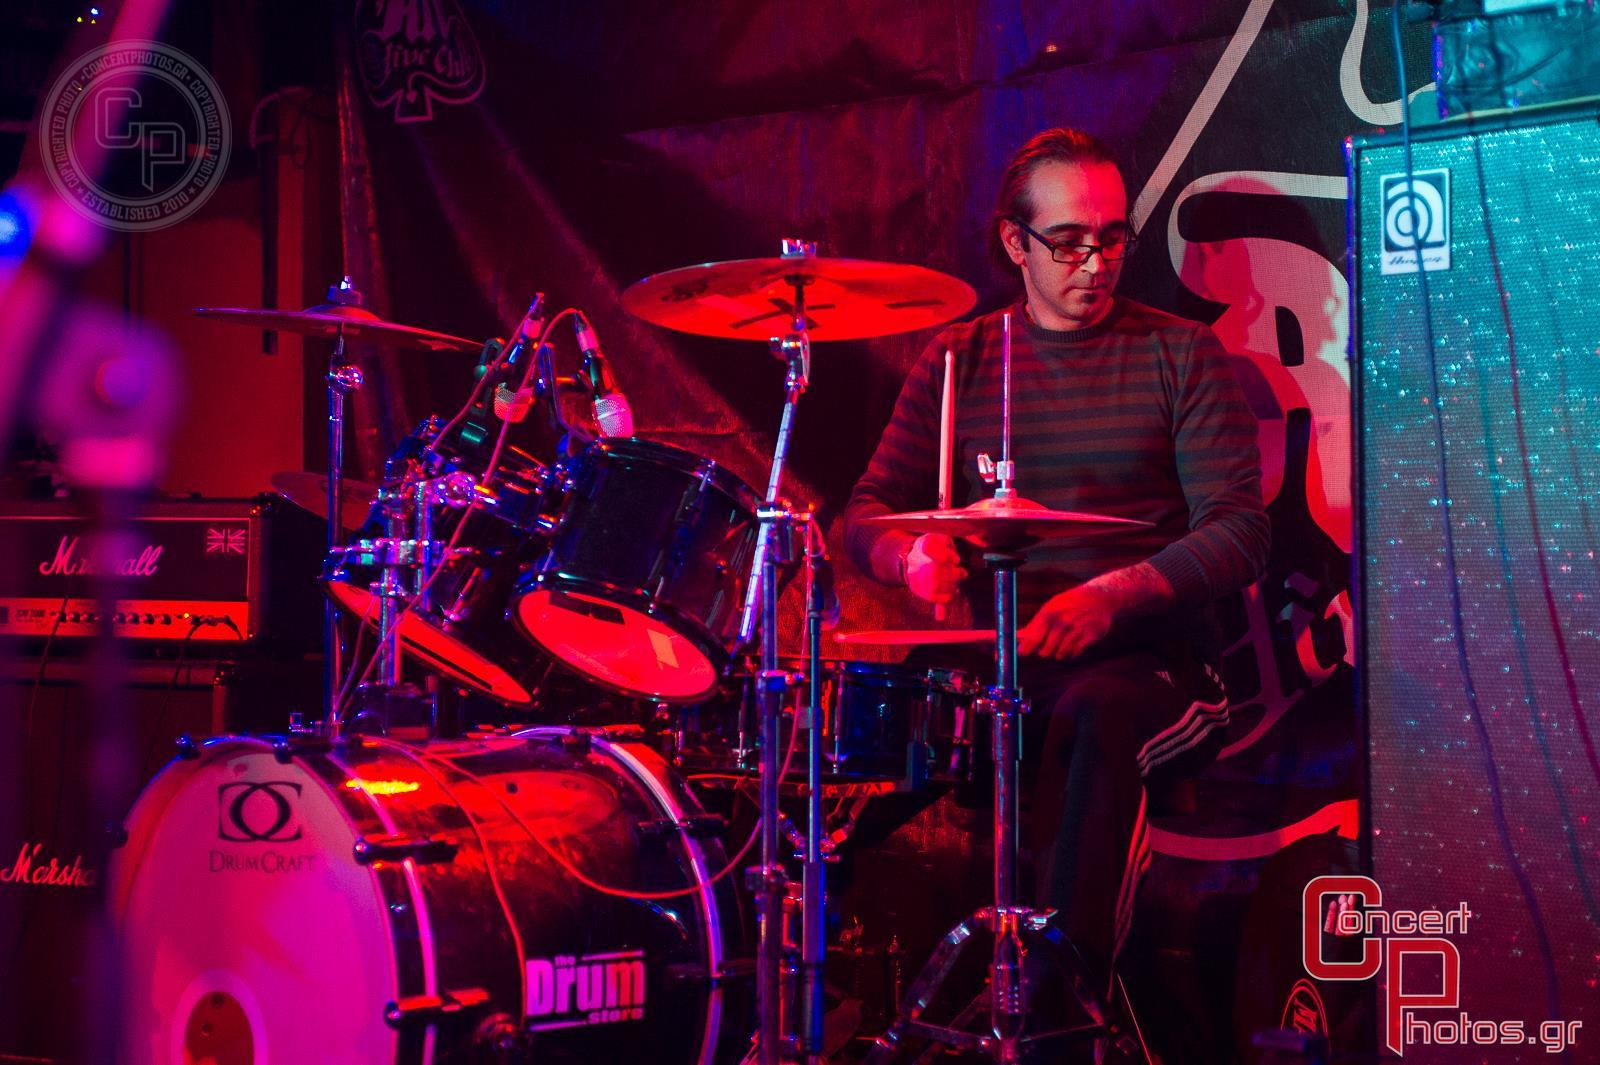 Battle Of The Bands Leg 1-Battle Of The Bands Leg 1 photographer:  - ConcertPhotos - 20141126_2315_44